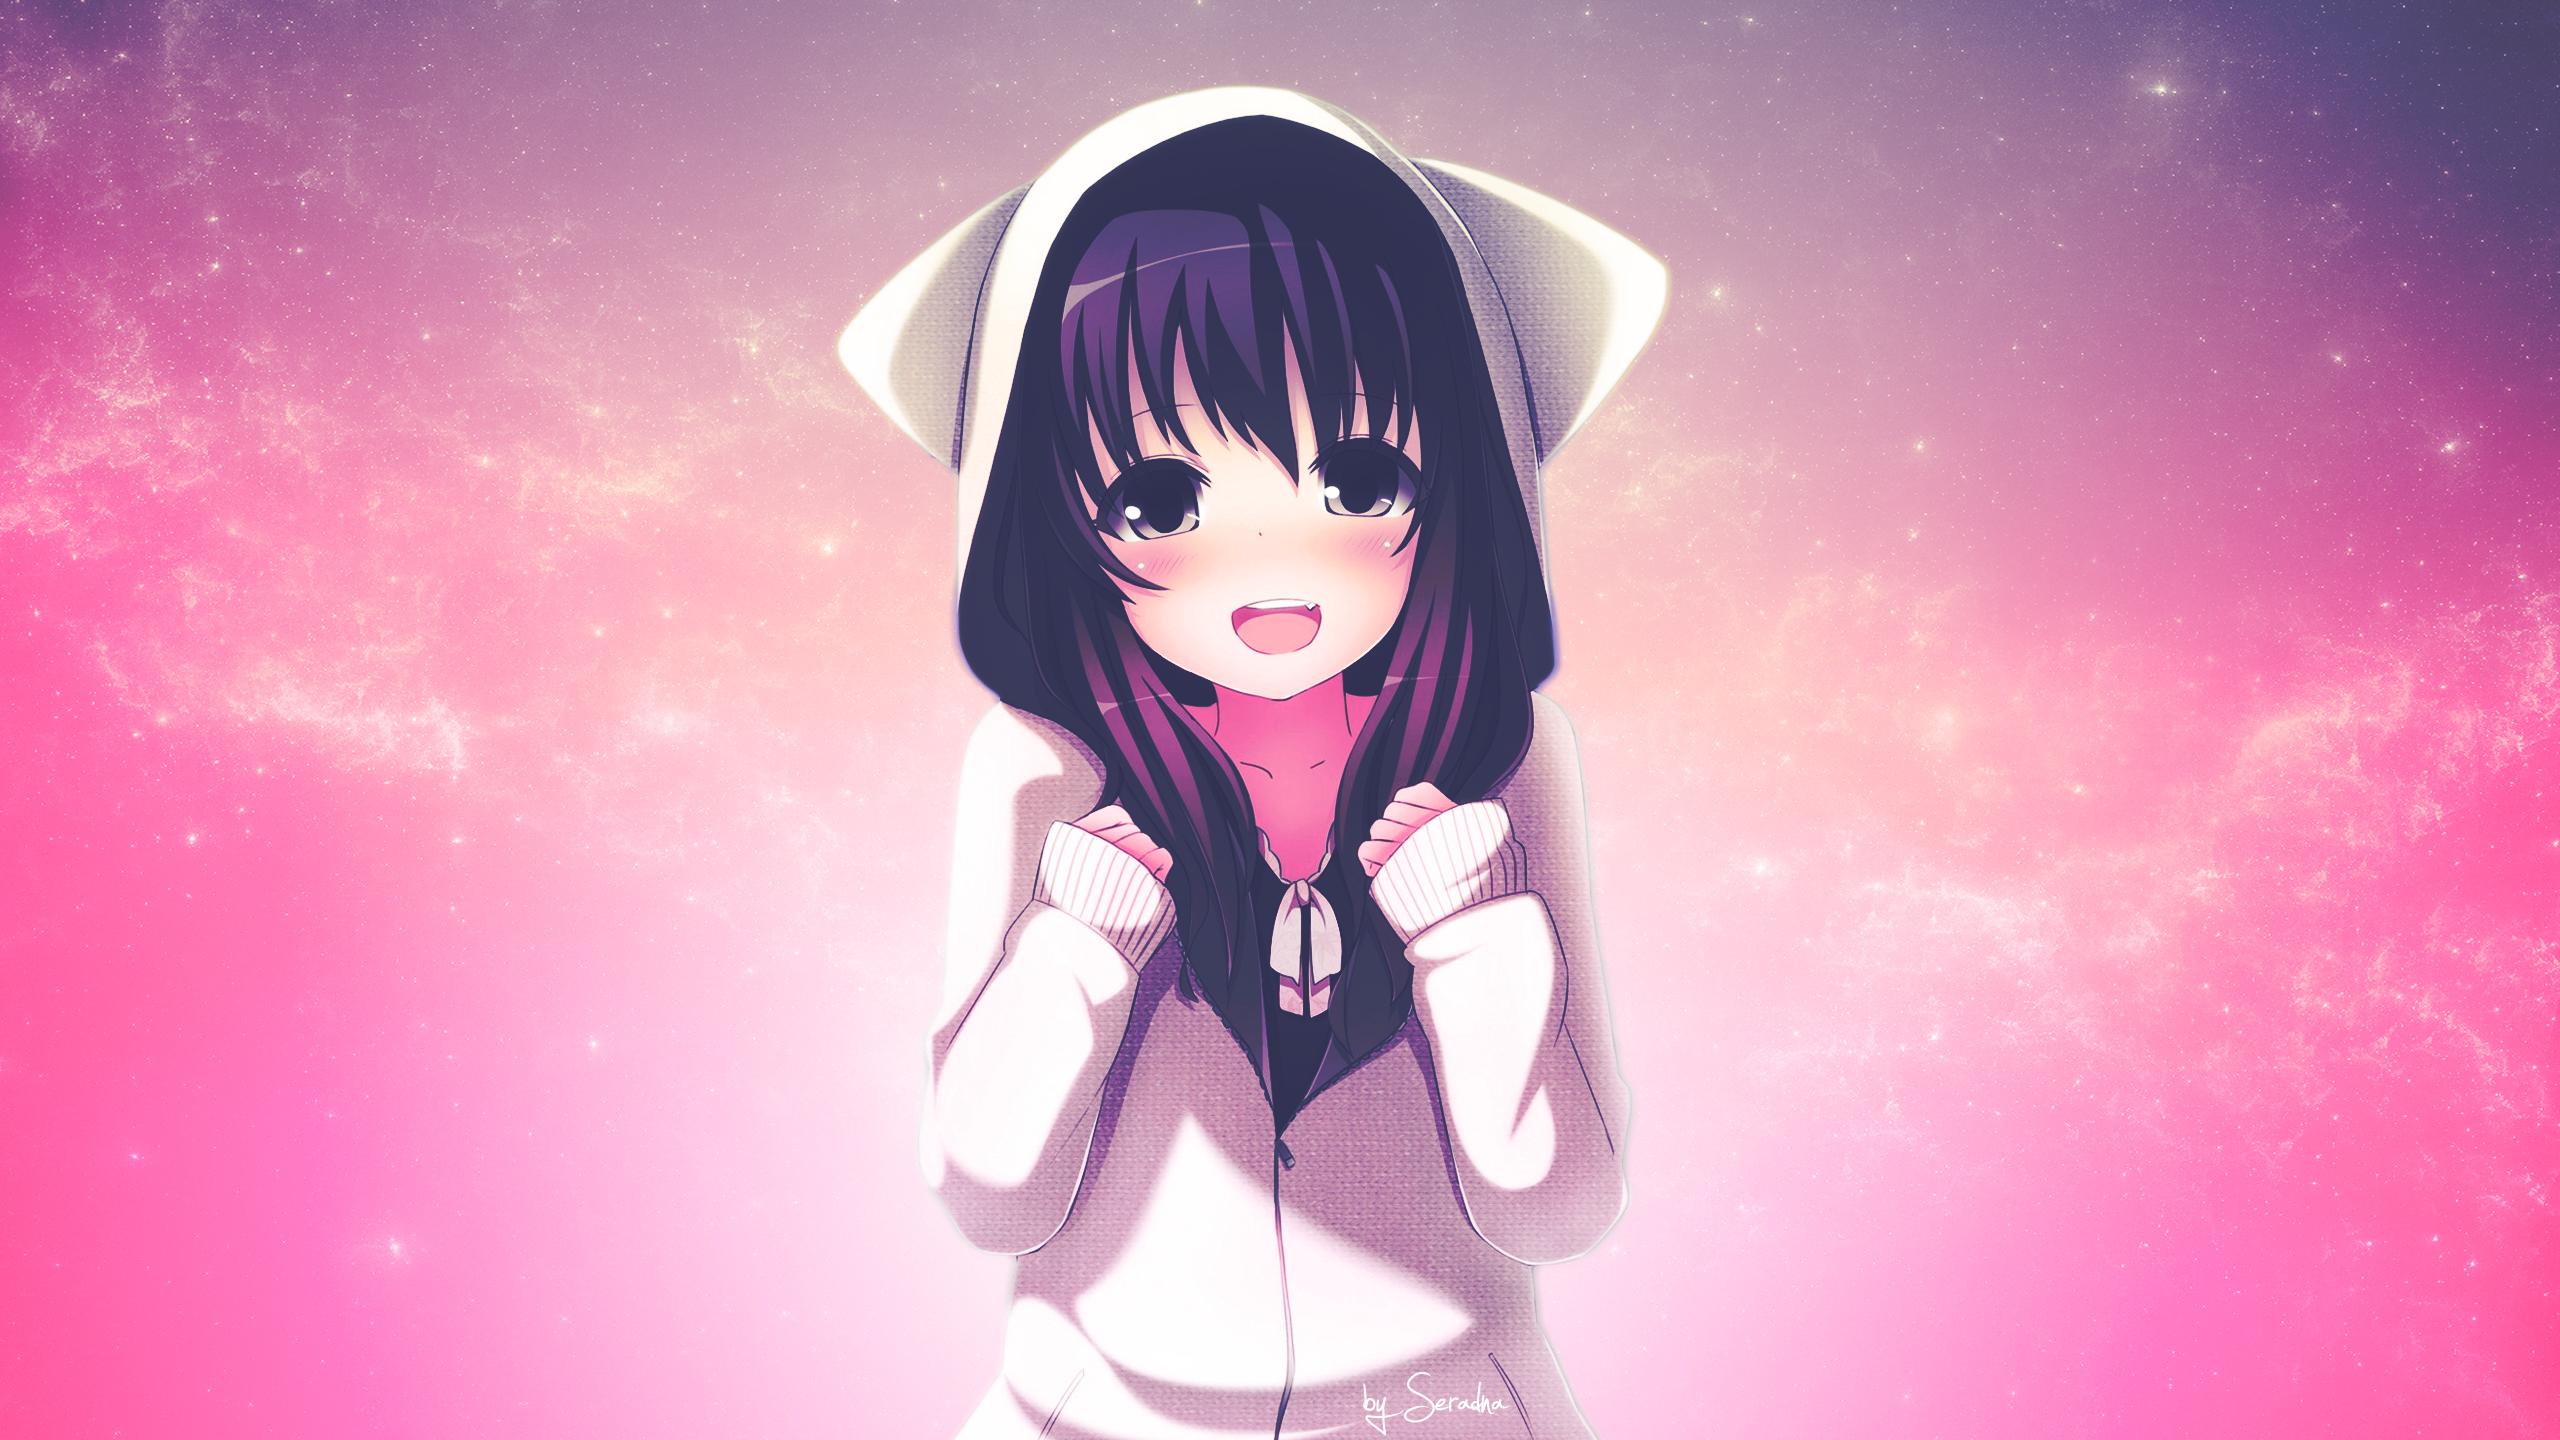 Anime Girl Backgrounds Group (26+)